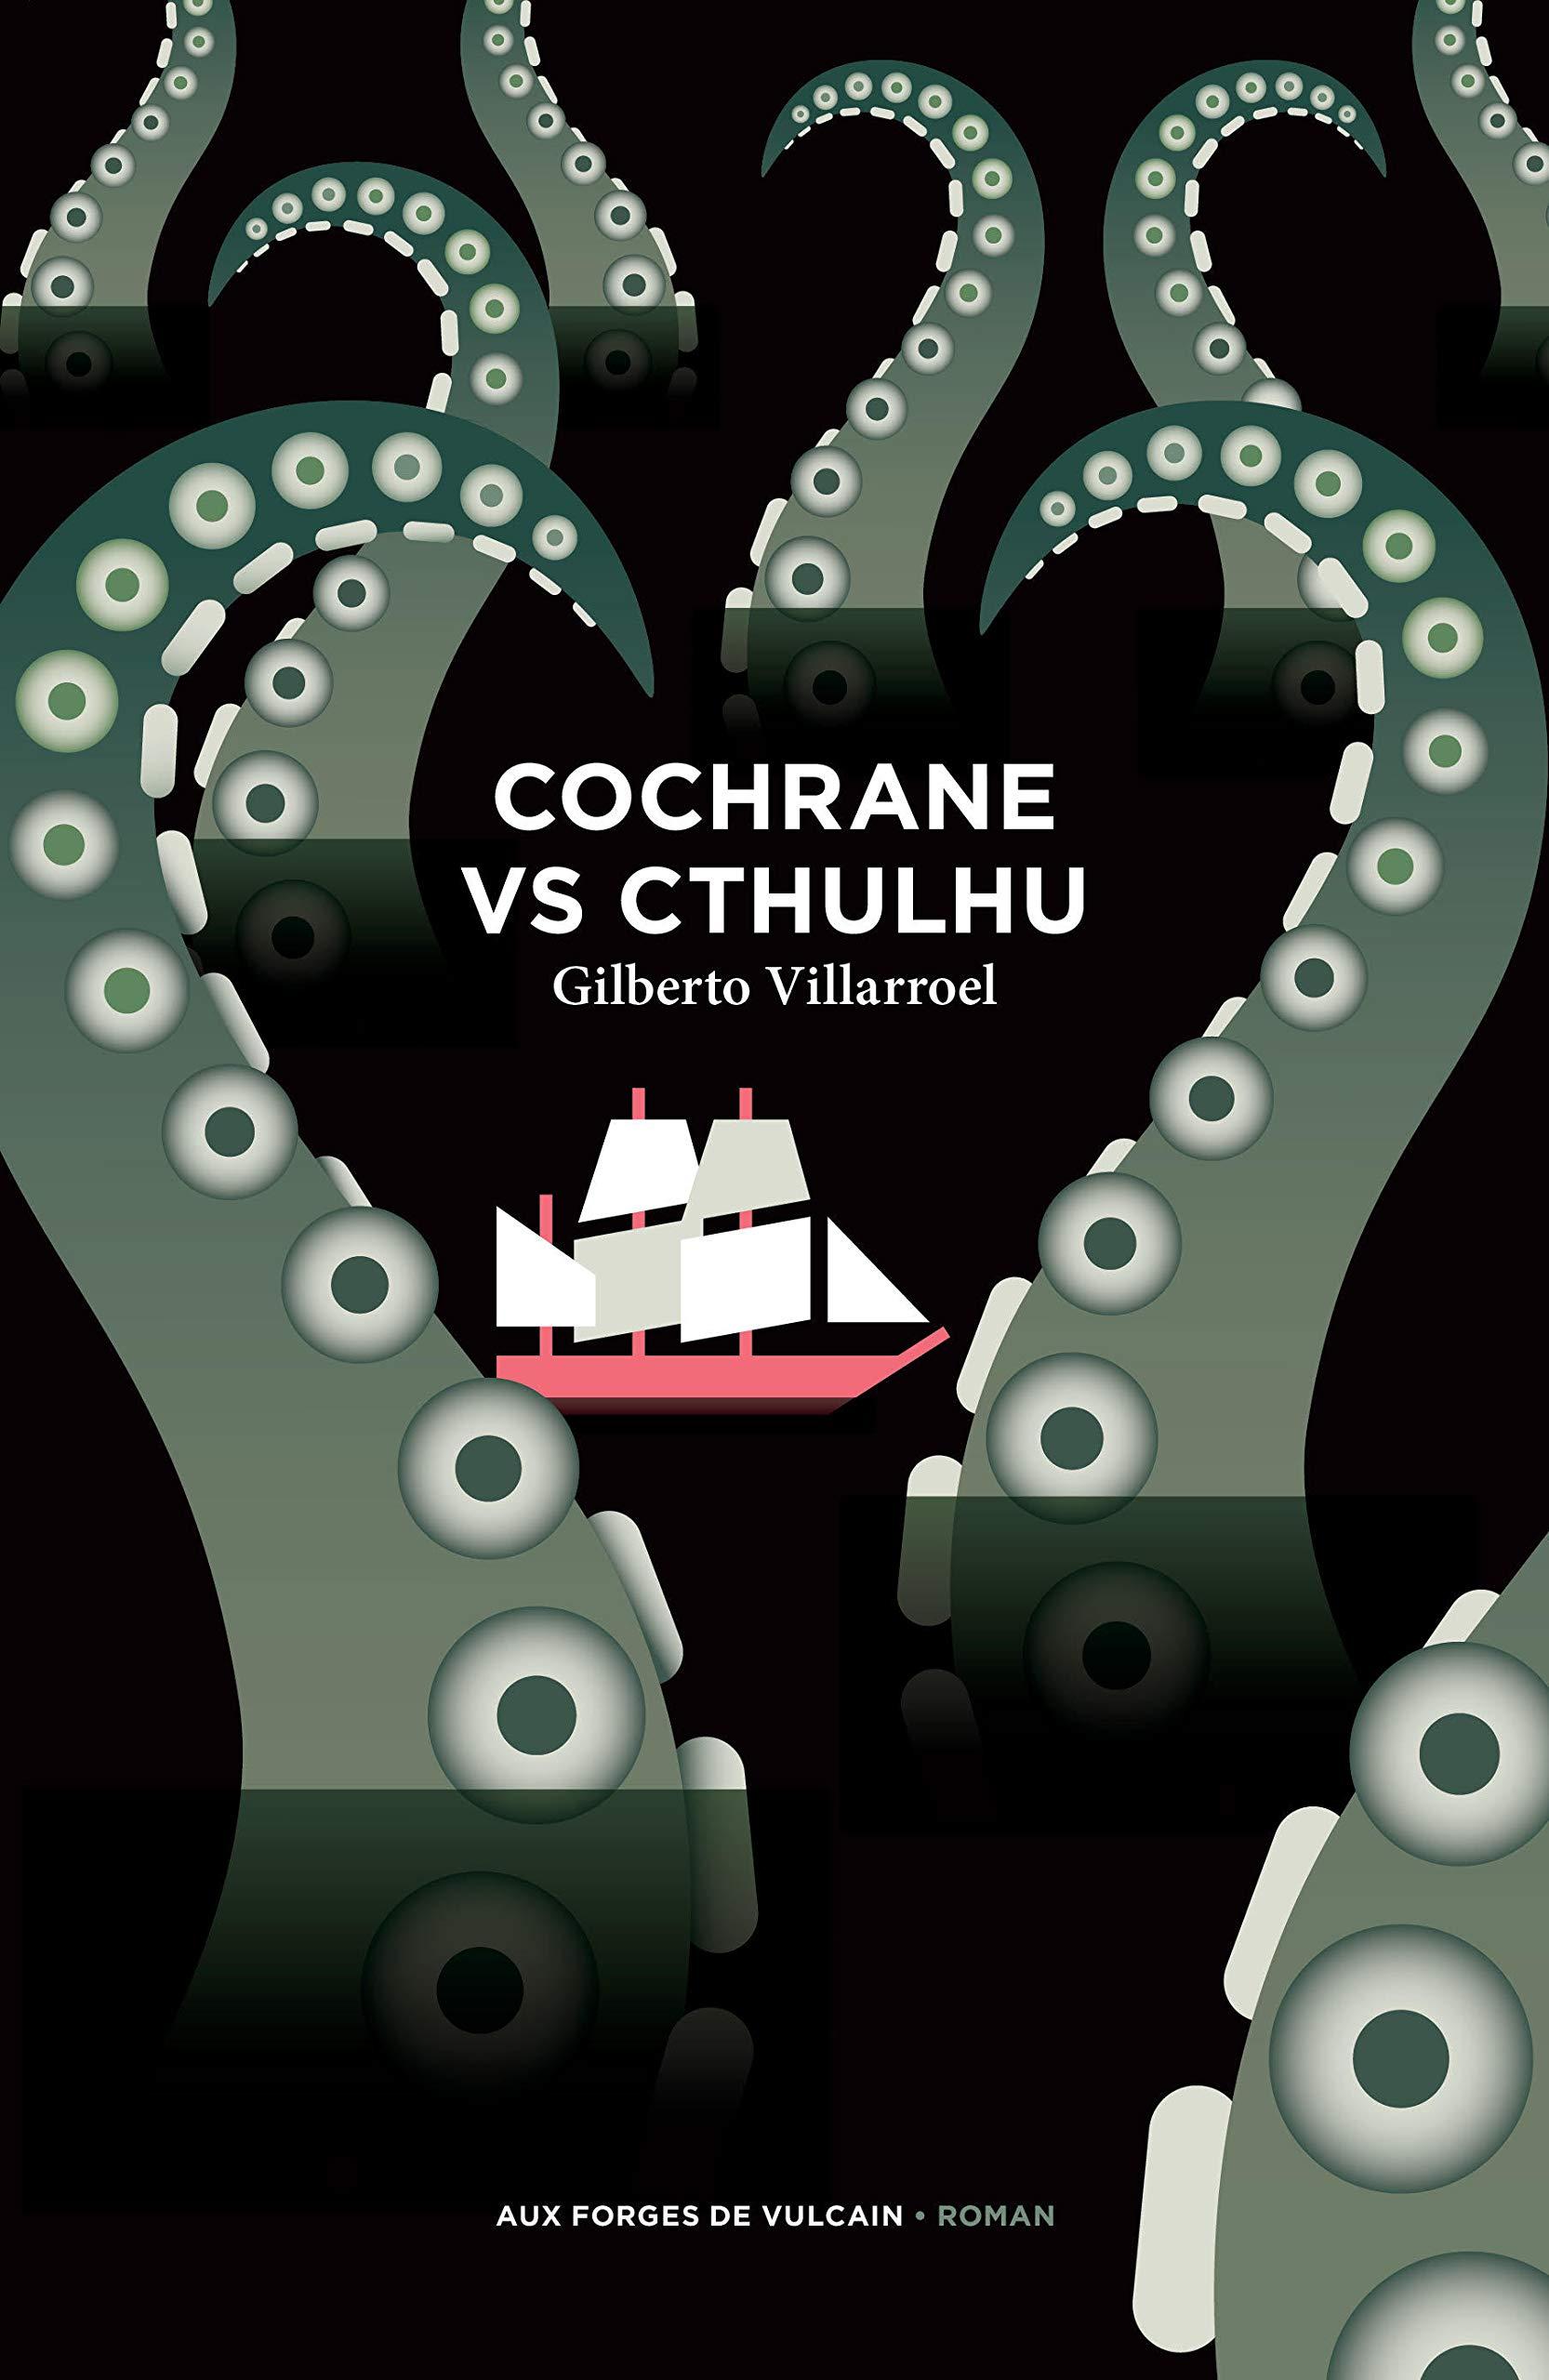 «Cochrane vs Cthulhu», de Gilberto Villaroel